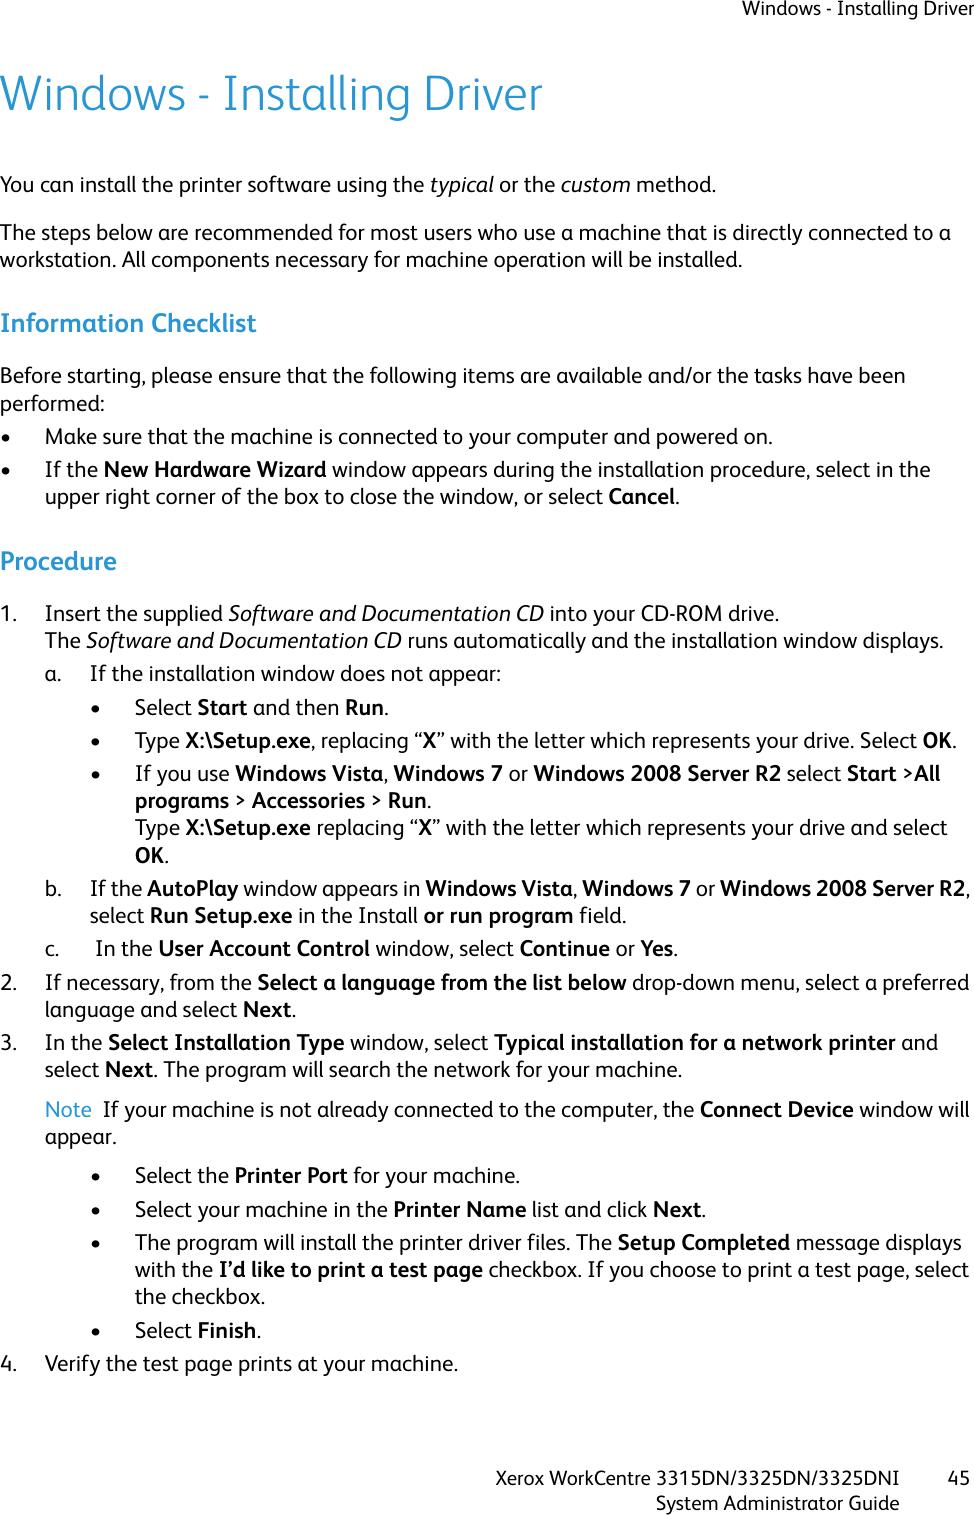 Xerox Workcentre 3315 3325 Administrators Guide 00_SAG